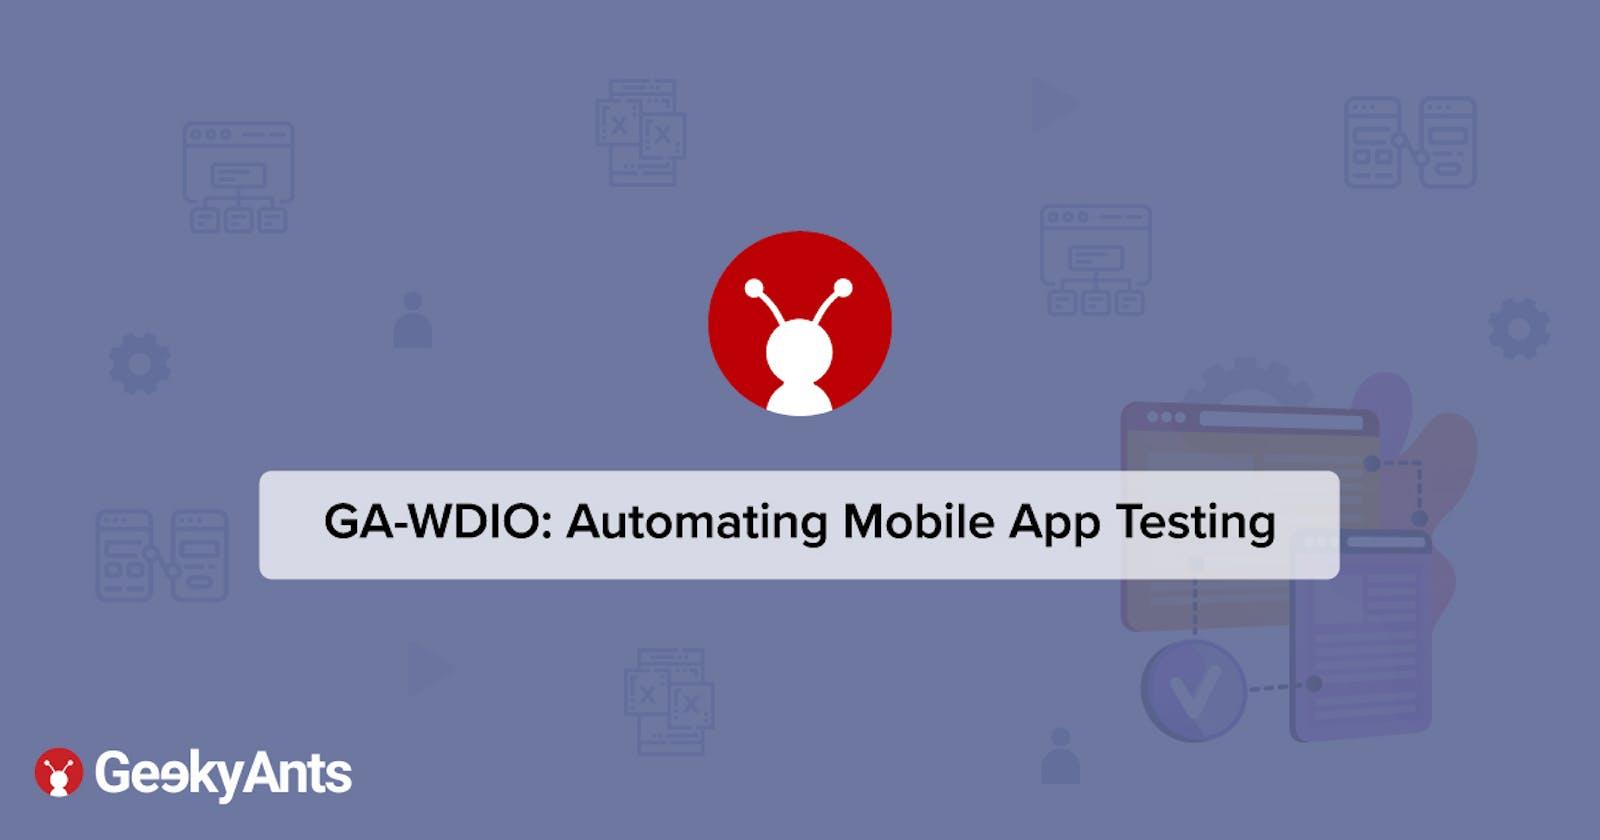 GA-WDIO: Automating Mobile App Testing